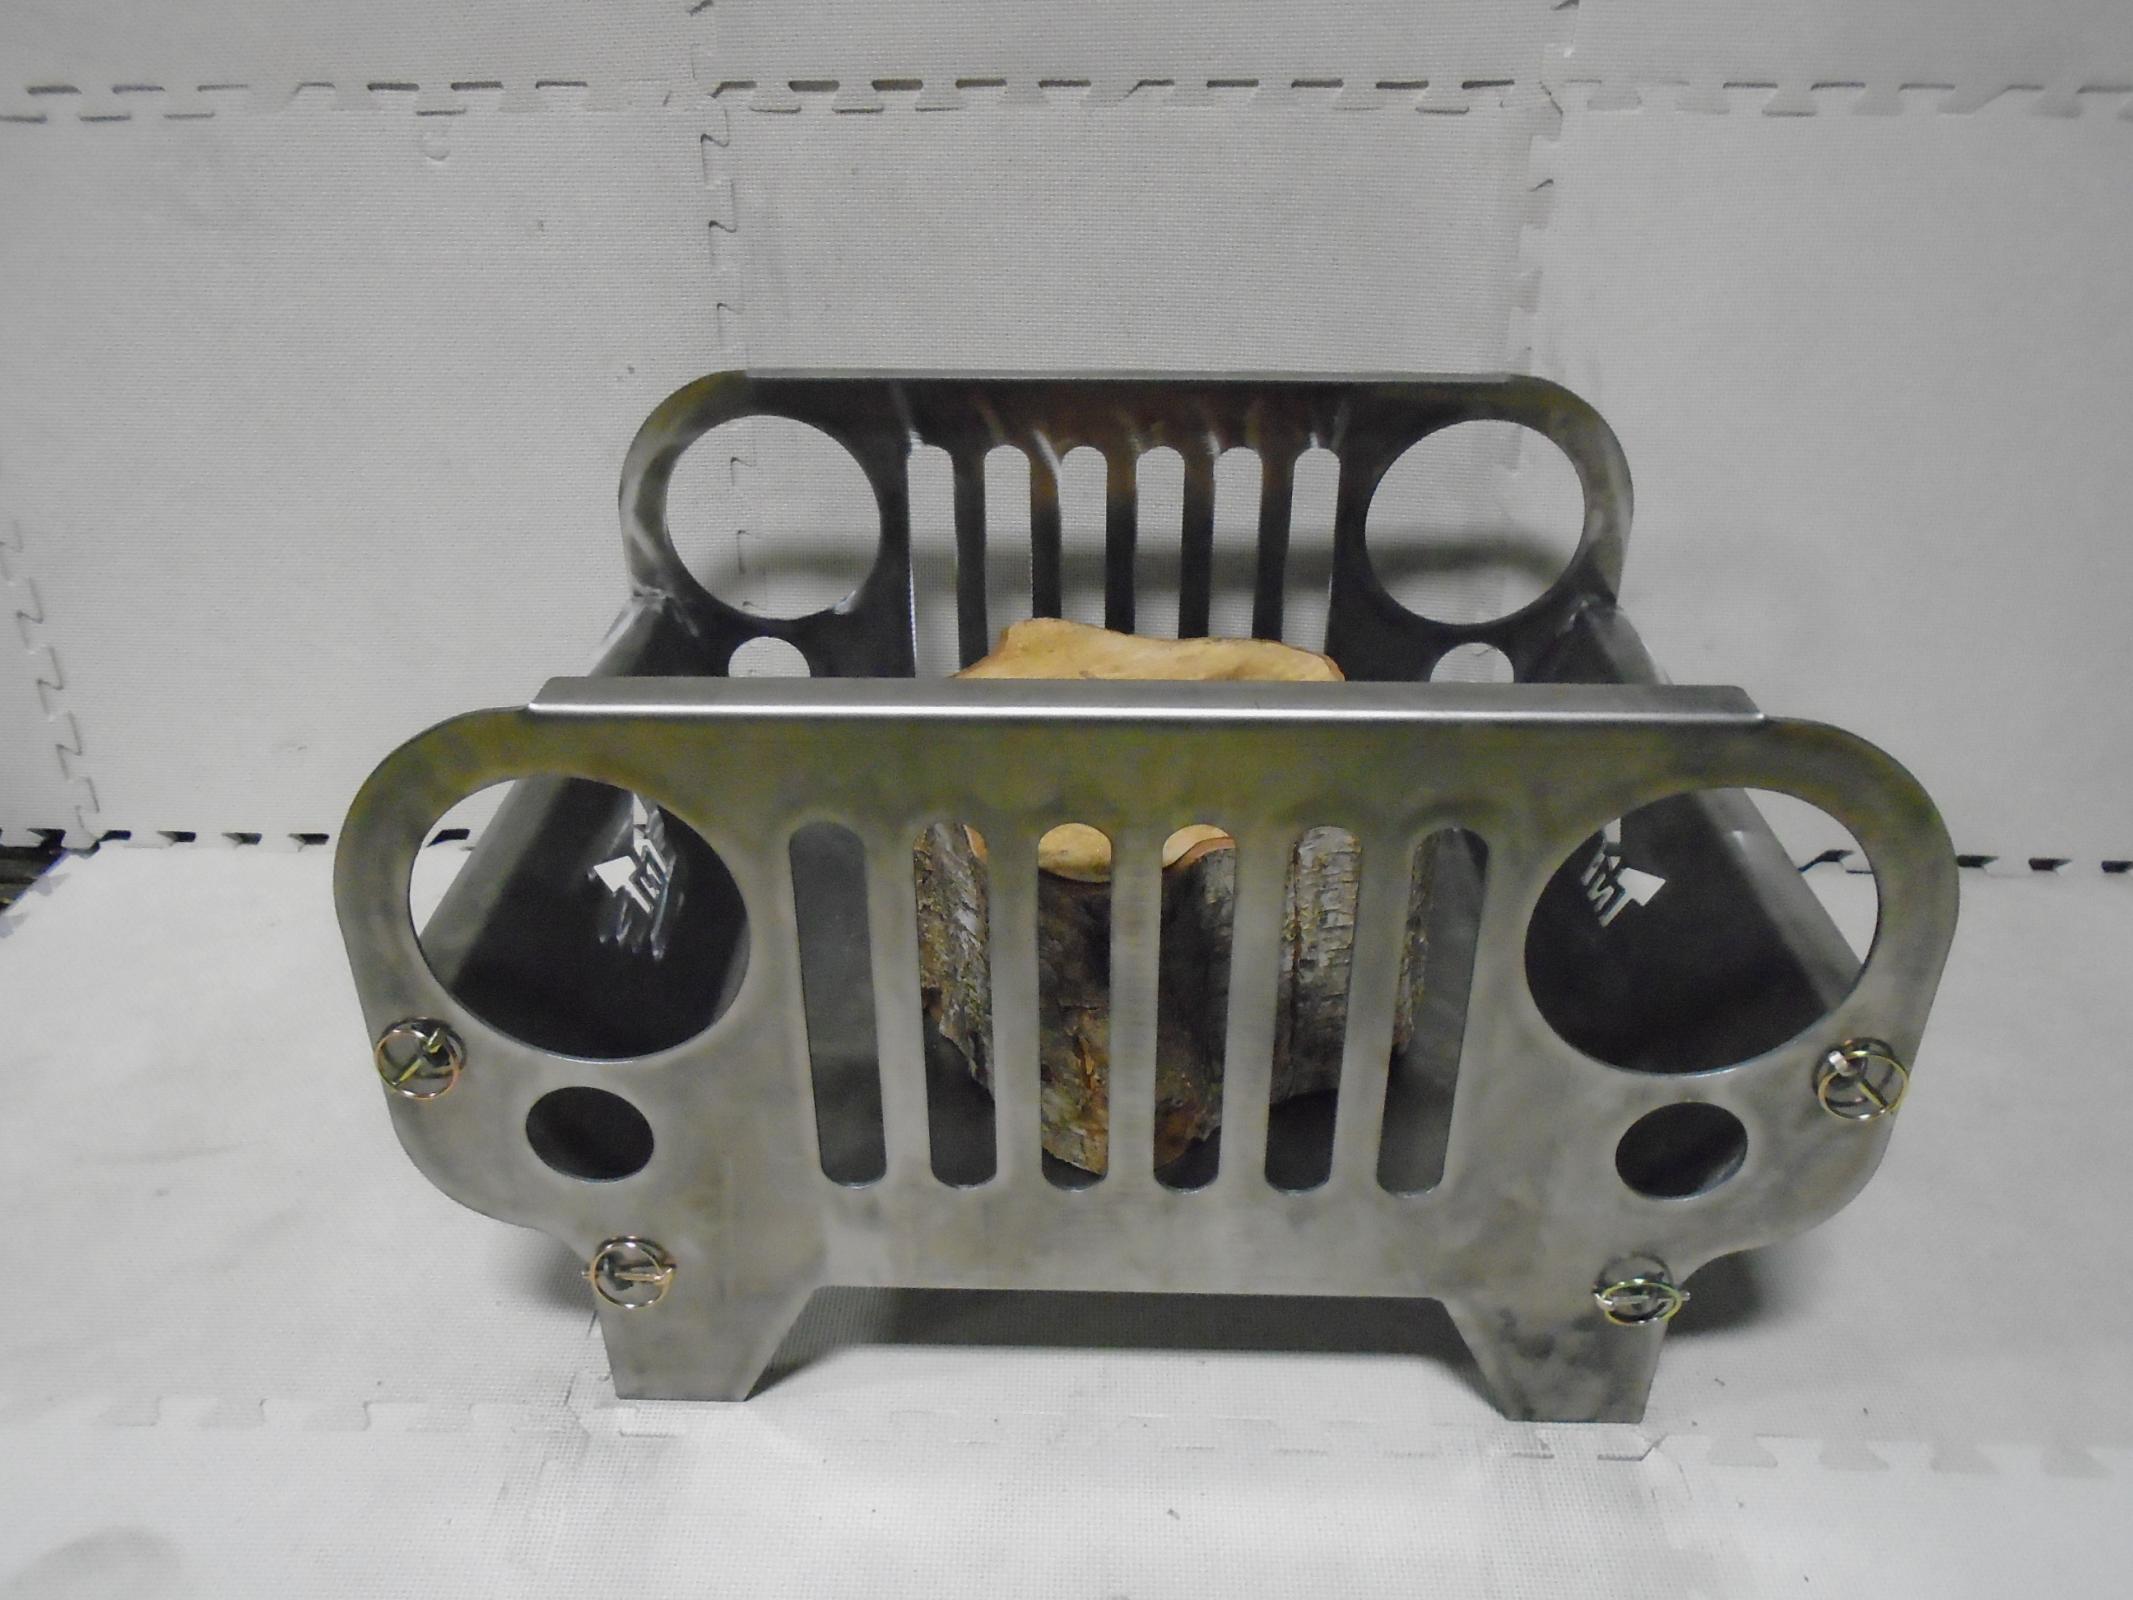 TNT Customs FPJK - Wrangler JK Fire Pit 07-Pres Wrangler JK